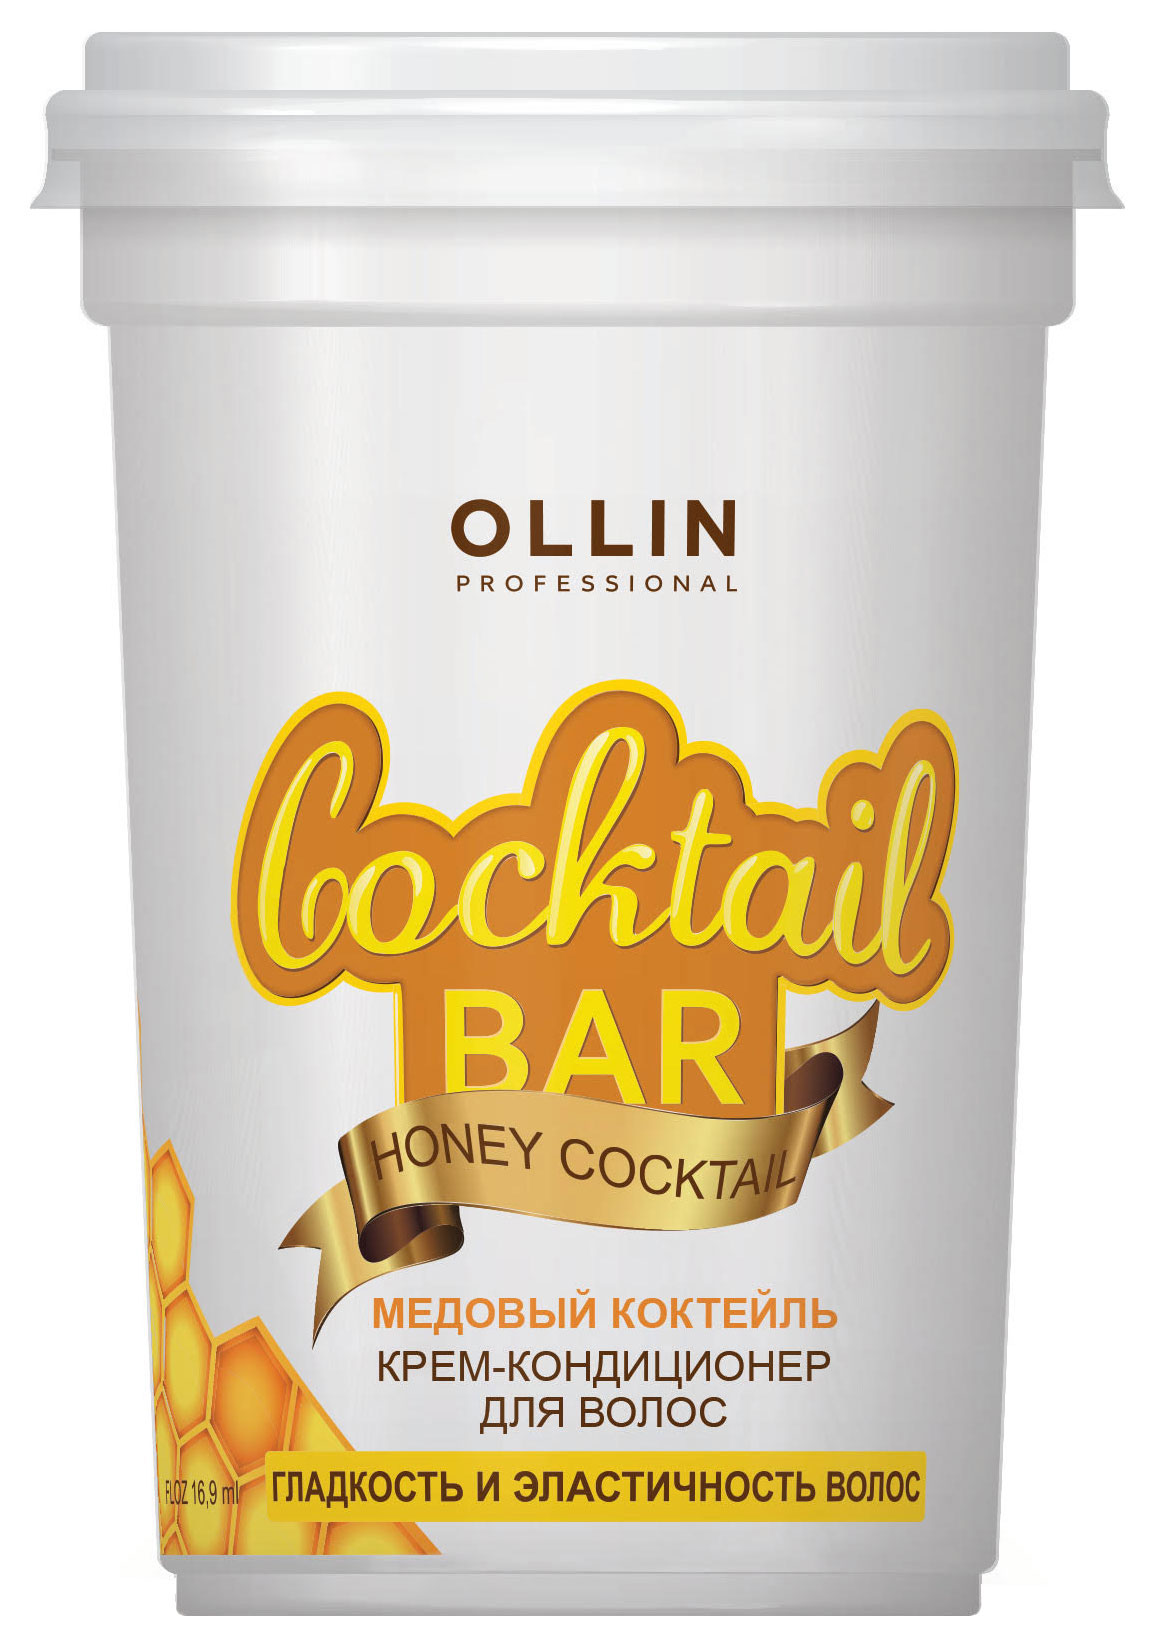 Кондиционер для волос Ollin Professional Cocktail Bar Honey Cocktail 500 мл фото